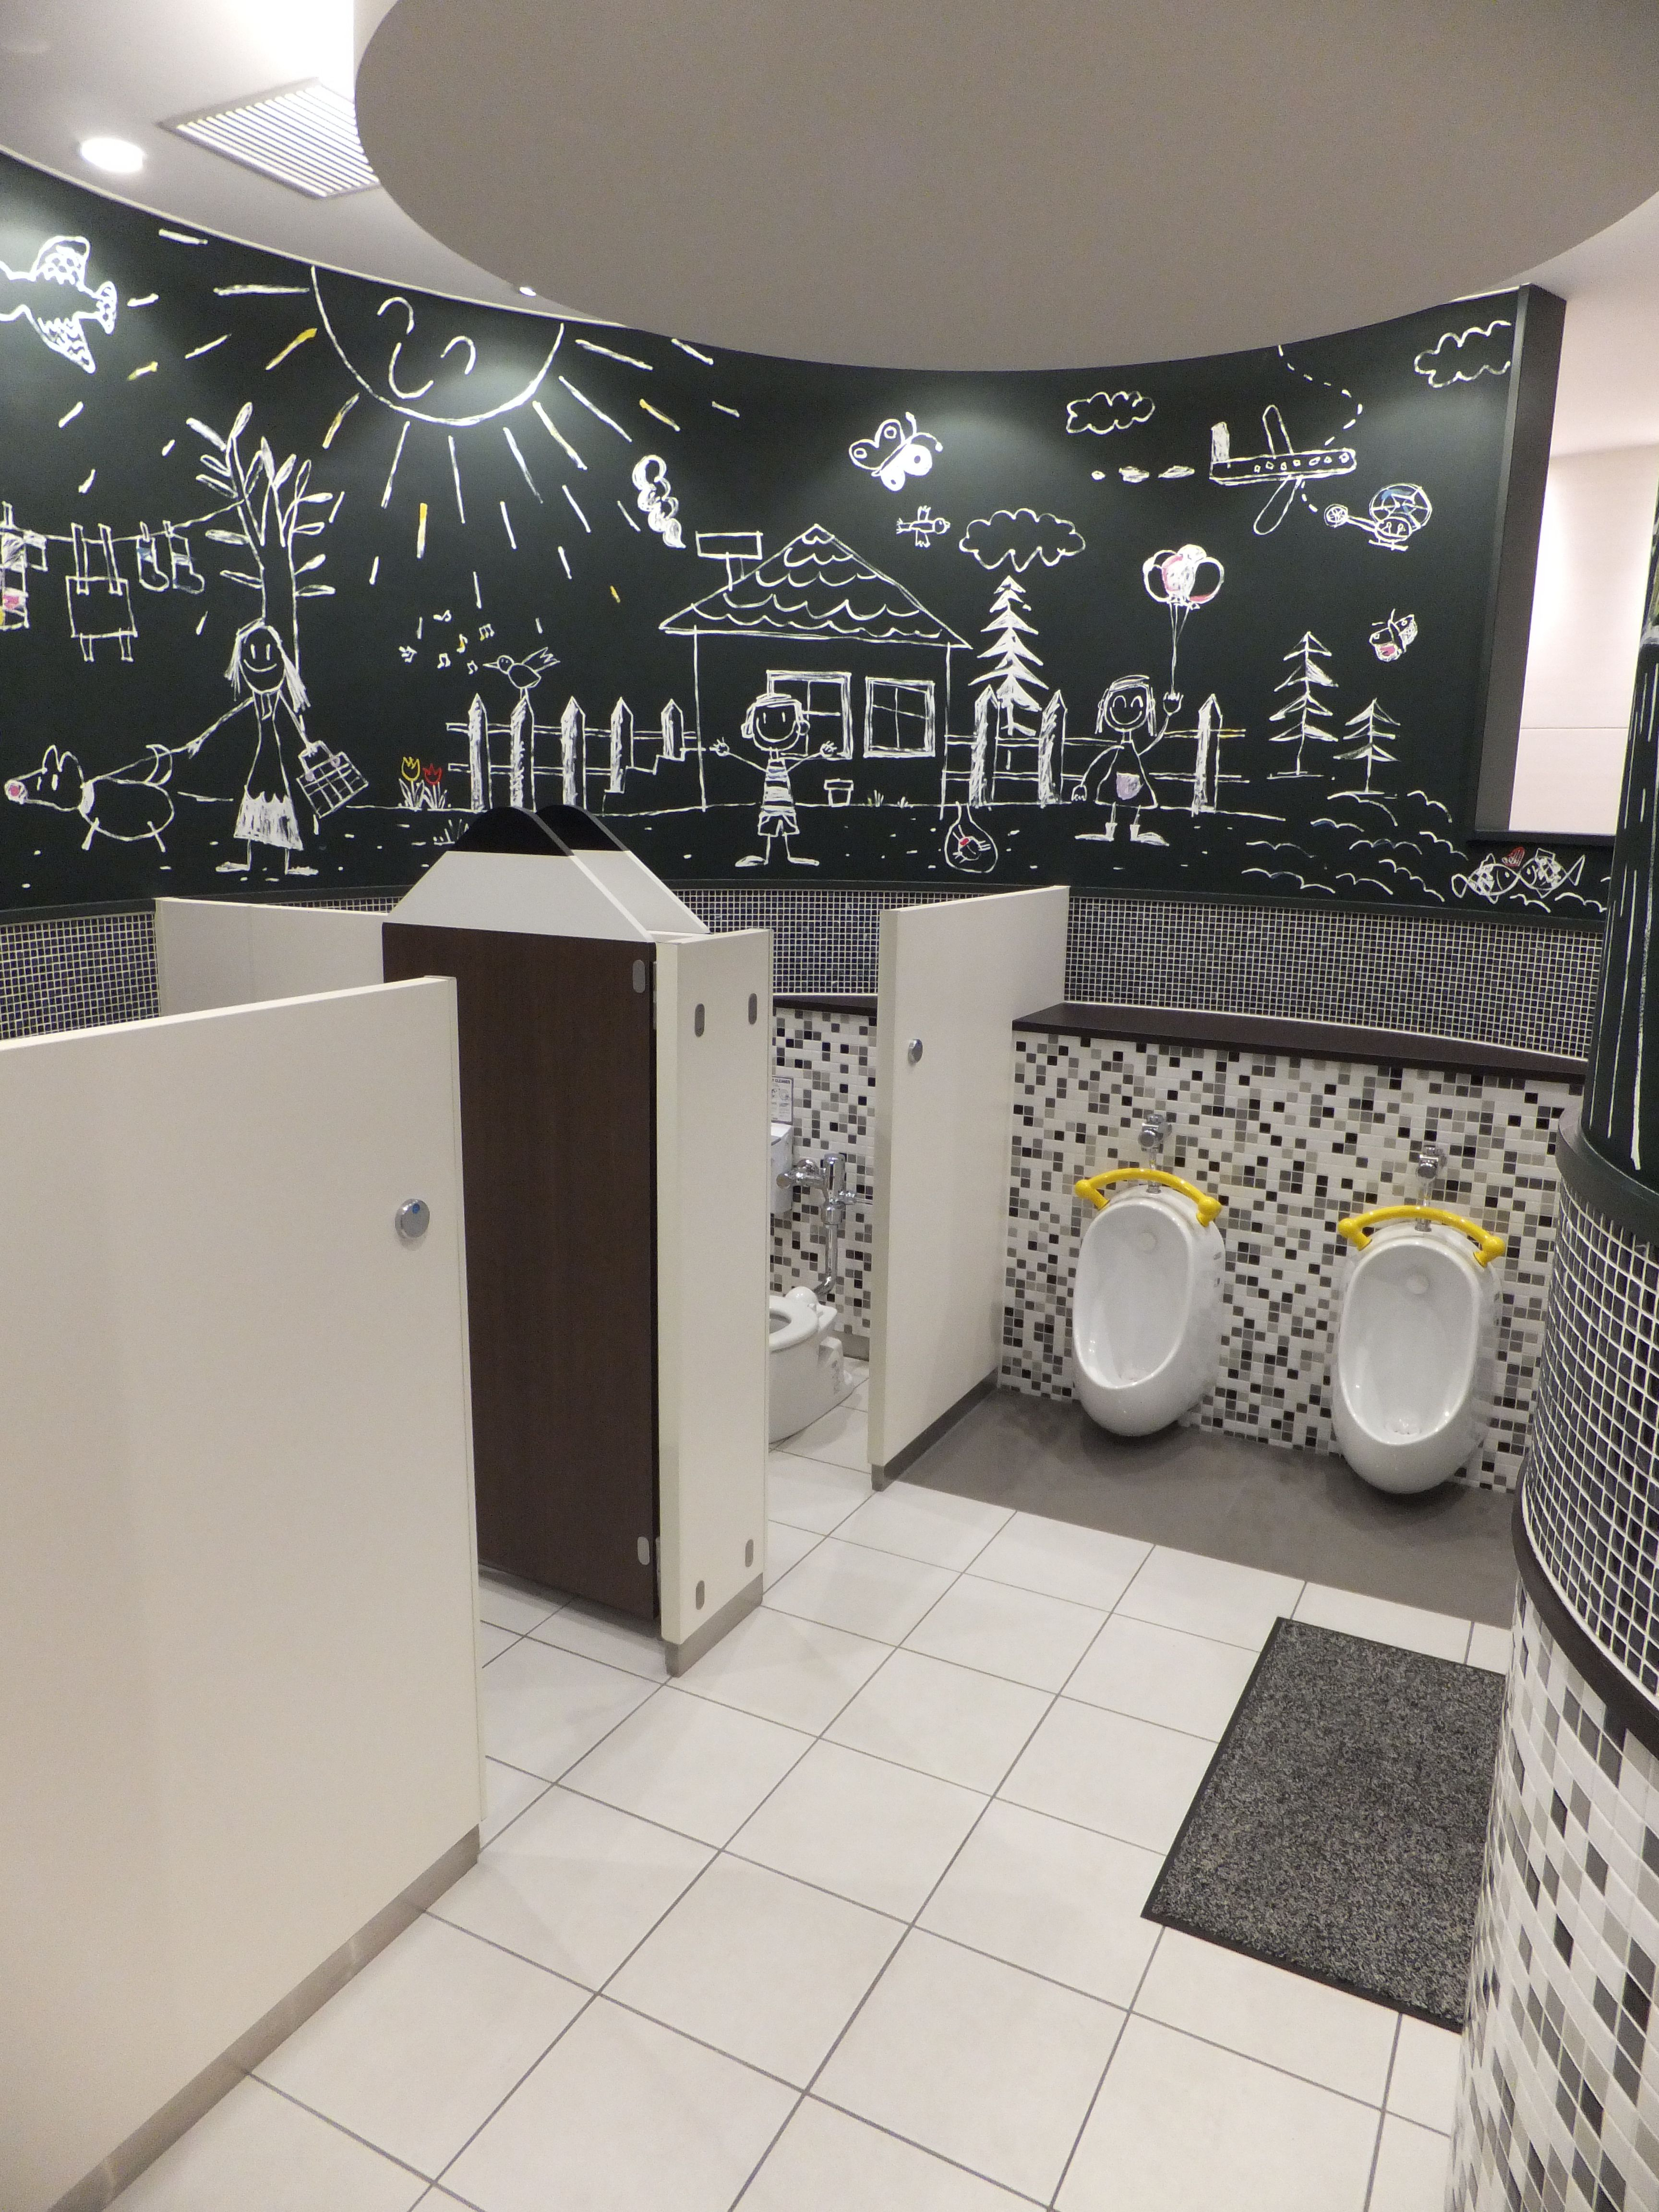 Children school restroom bathroom restroom badezimmer for Raumgestaltung offener kindergarten